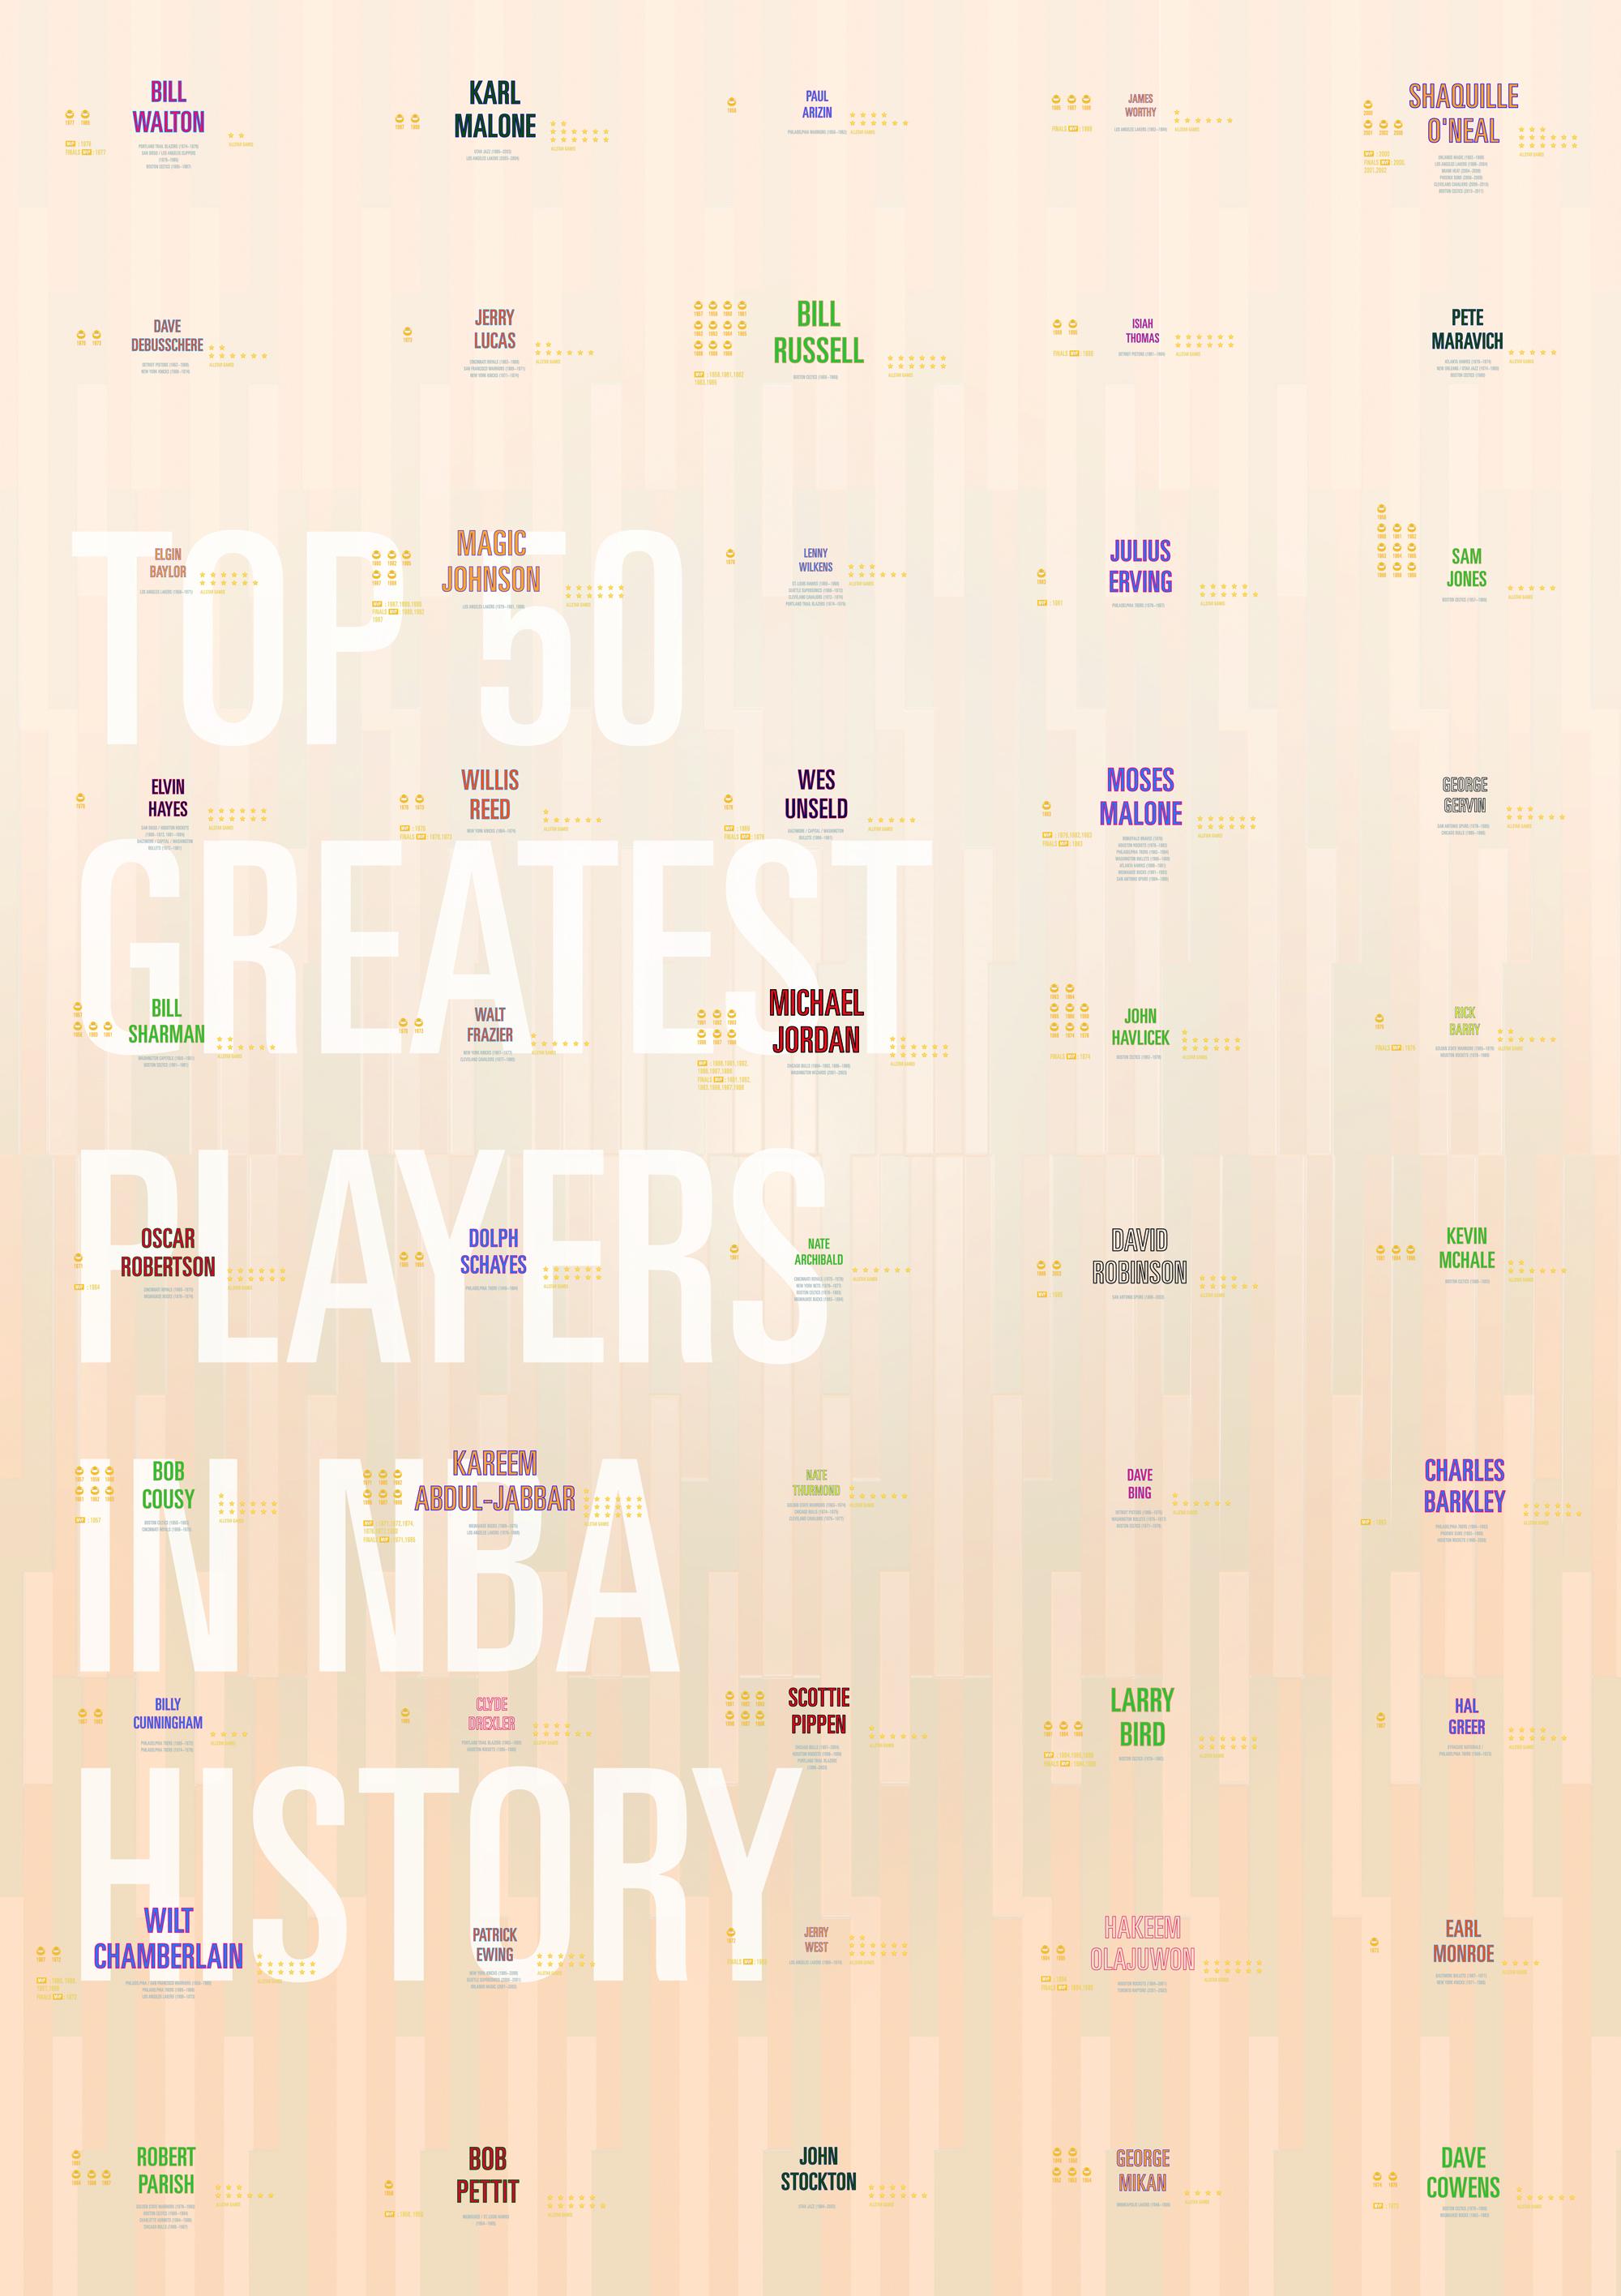 NBA all time statistics